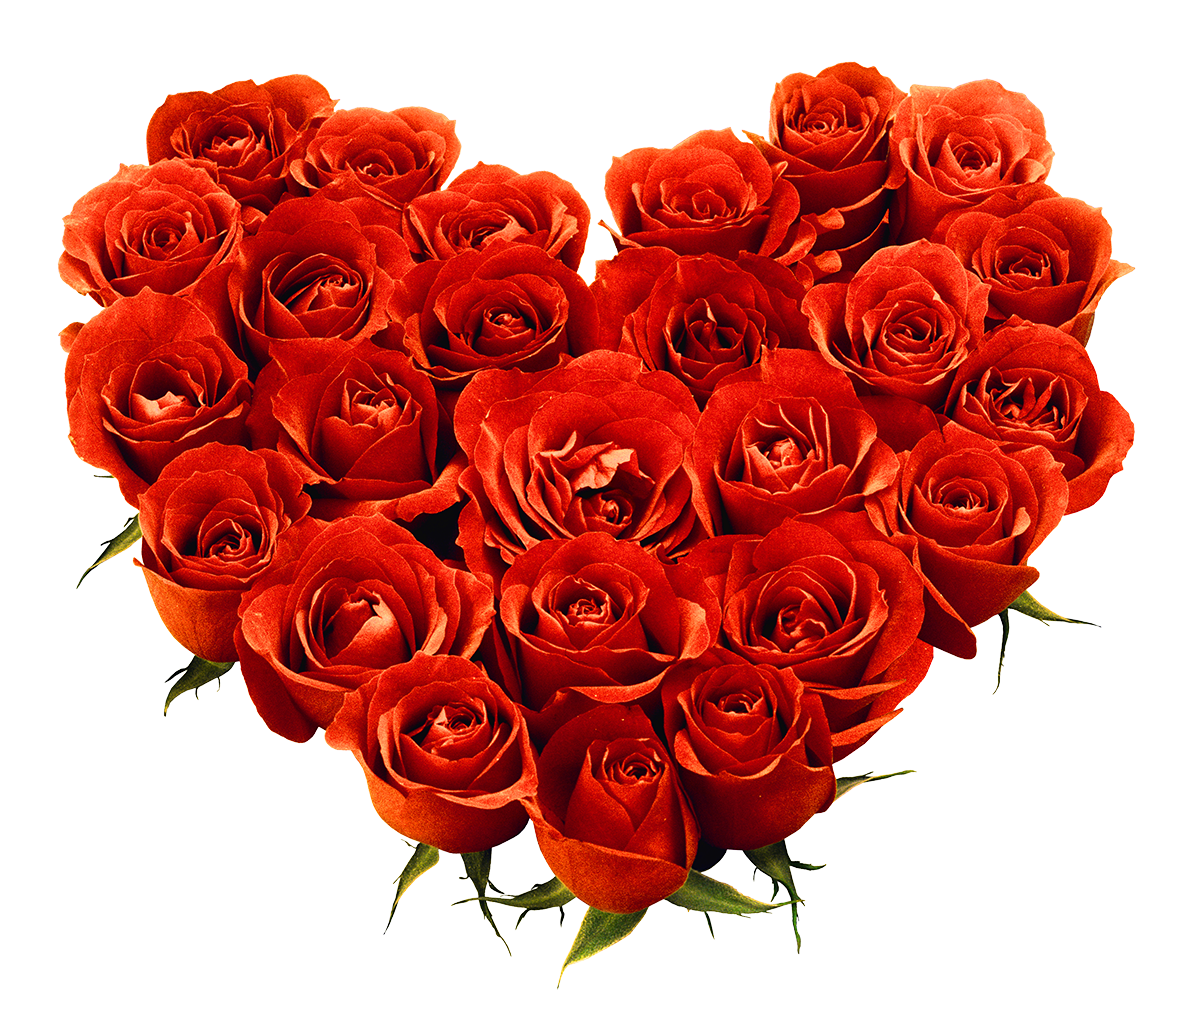 Hearts clipart bouquet. Rose png flower images